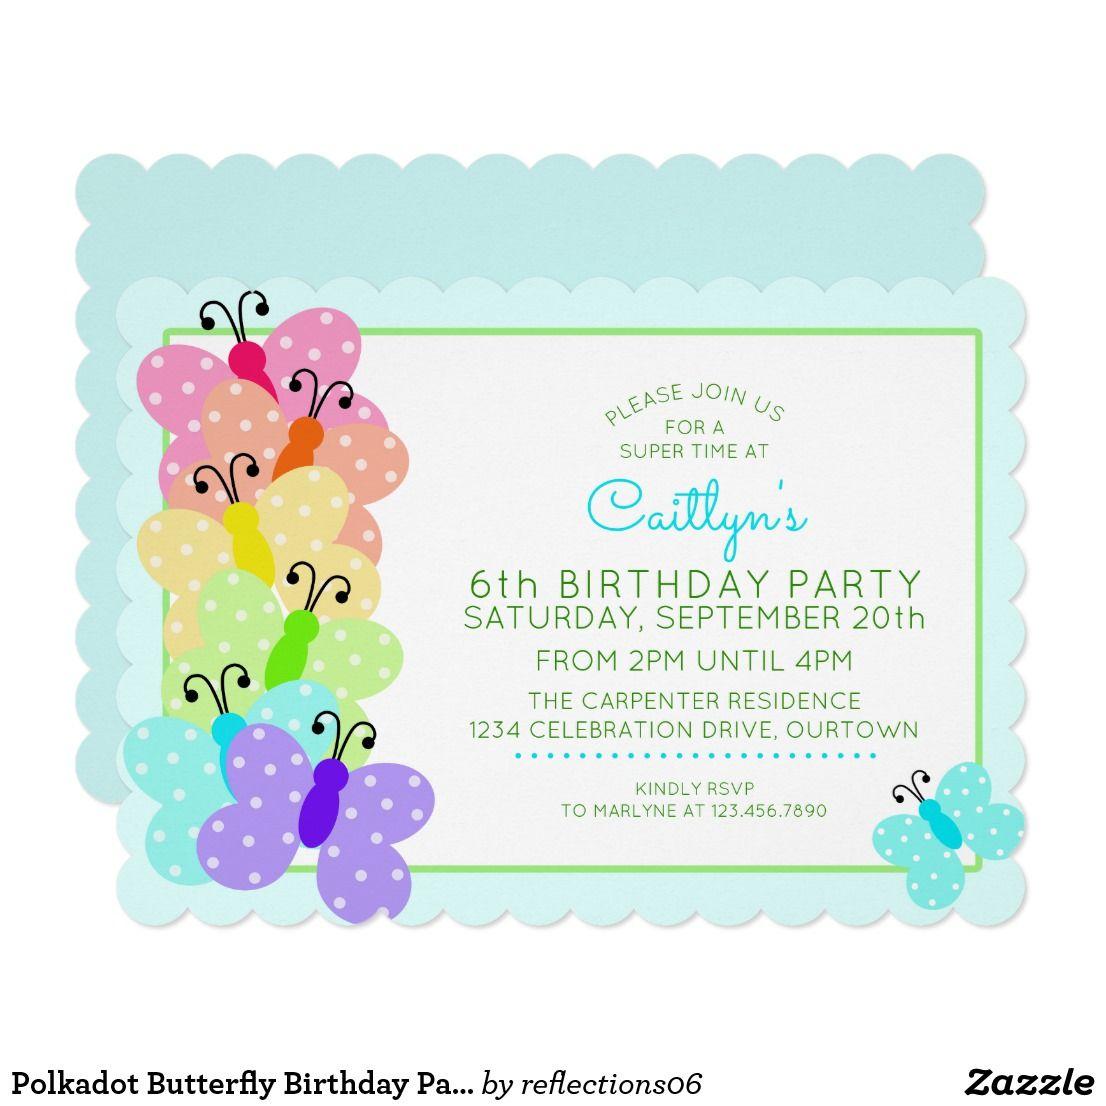 Polkadot Butterfly Birthday Party Invitation   Butterfly birthday ...